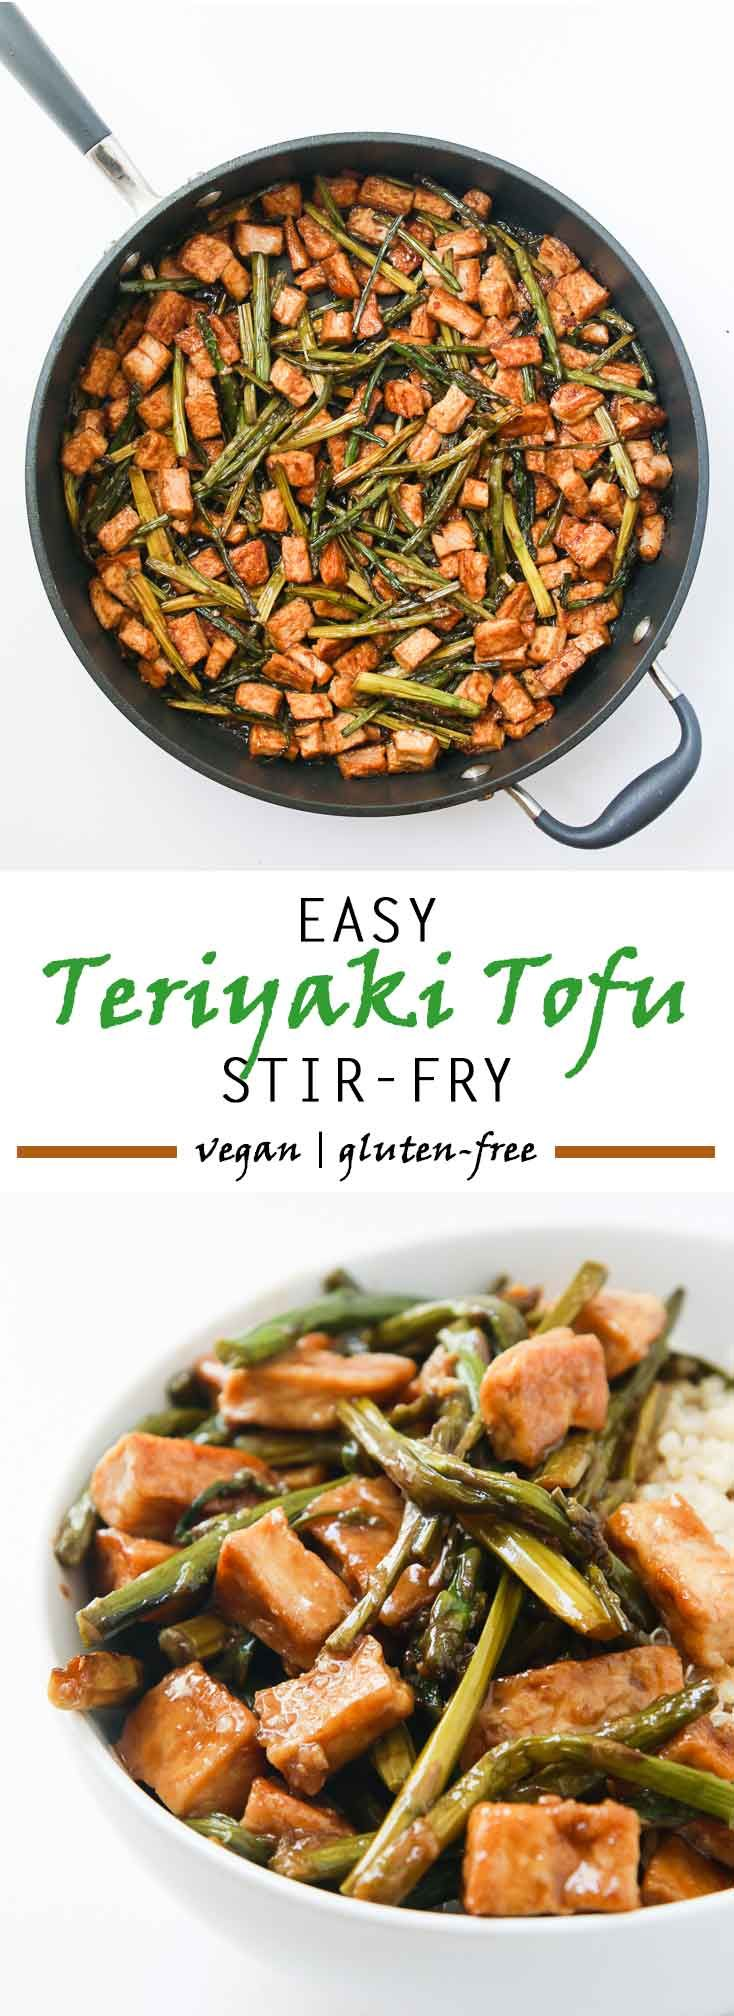 Easy Teriyaki Tofu Stir Fry with Asparagus #vegan #glutenfree | Vegetarian Gastronomy | www.vegetariangastronomy.com